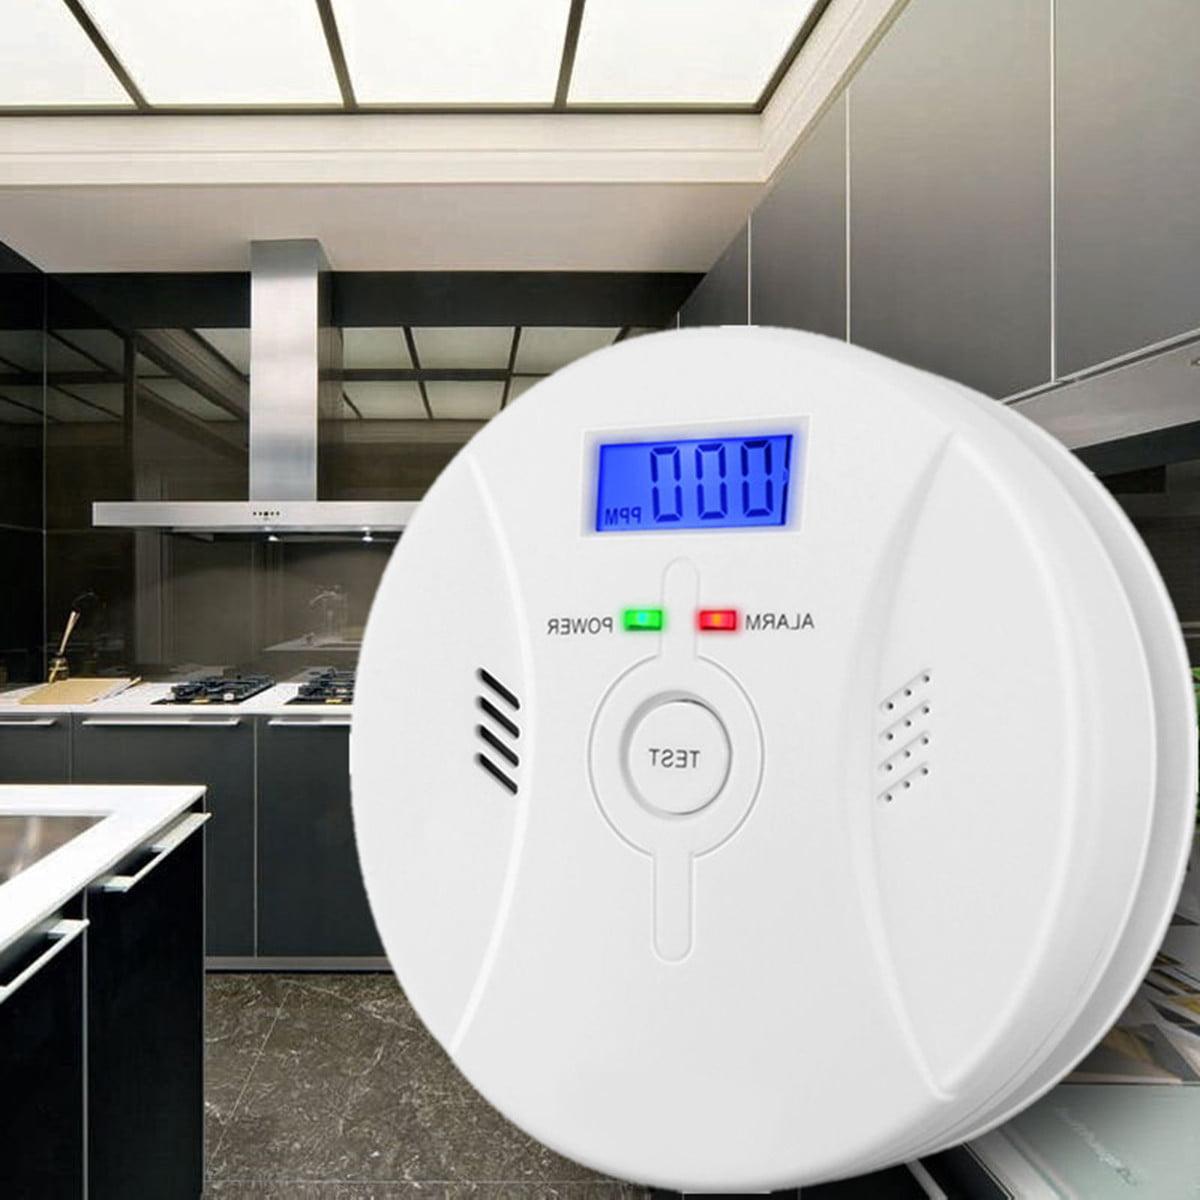 Arzil Smart 2-in-1 Carbon Monoxide CO & Smoke Sensor Detector  Ionization Voice Alarm Fire Alarm Wireless Sound & Flash Alarm Battery Operated Easy to Install Dual CO Smoke Alarm